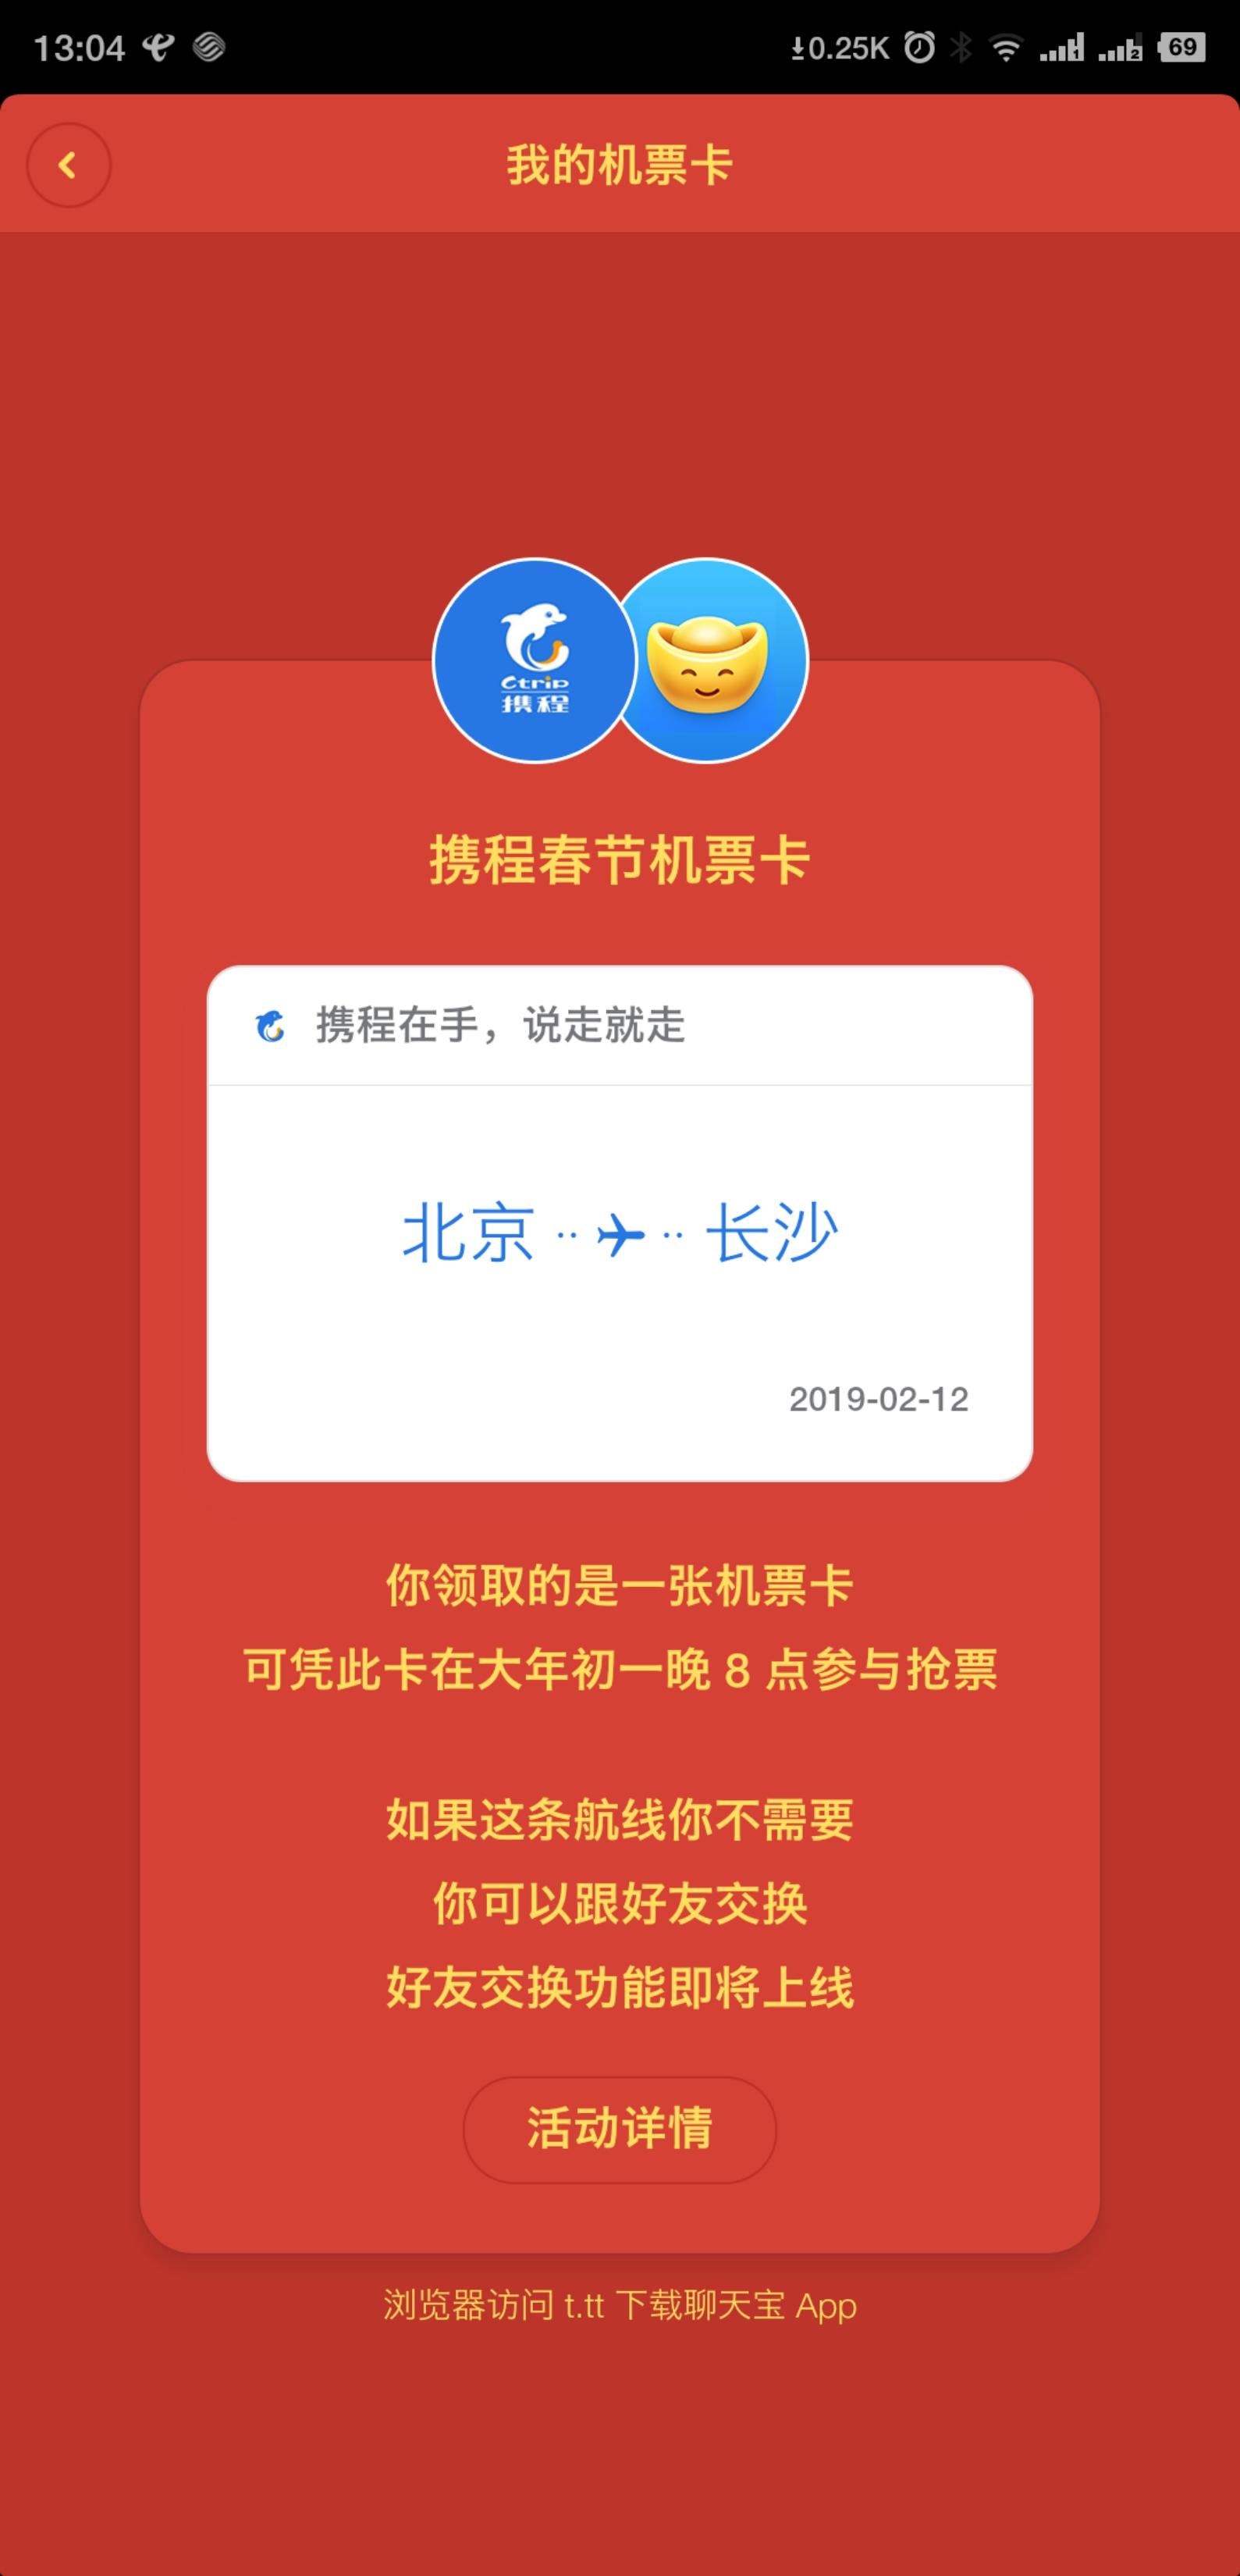 Screenshot_2019-01-21-13-04-51-922_???.png